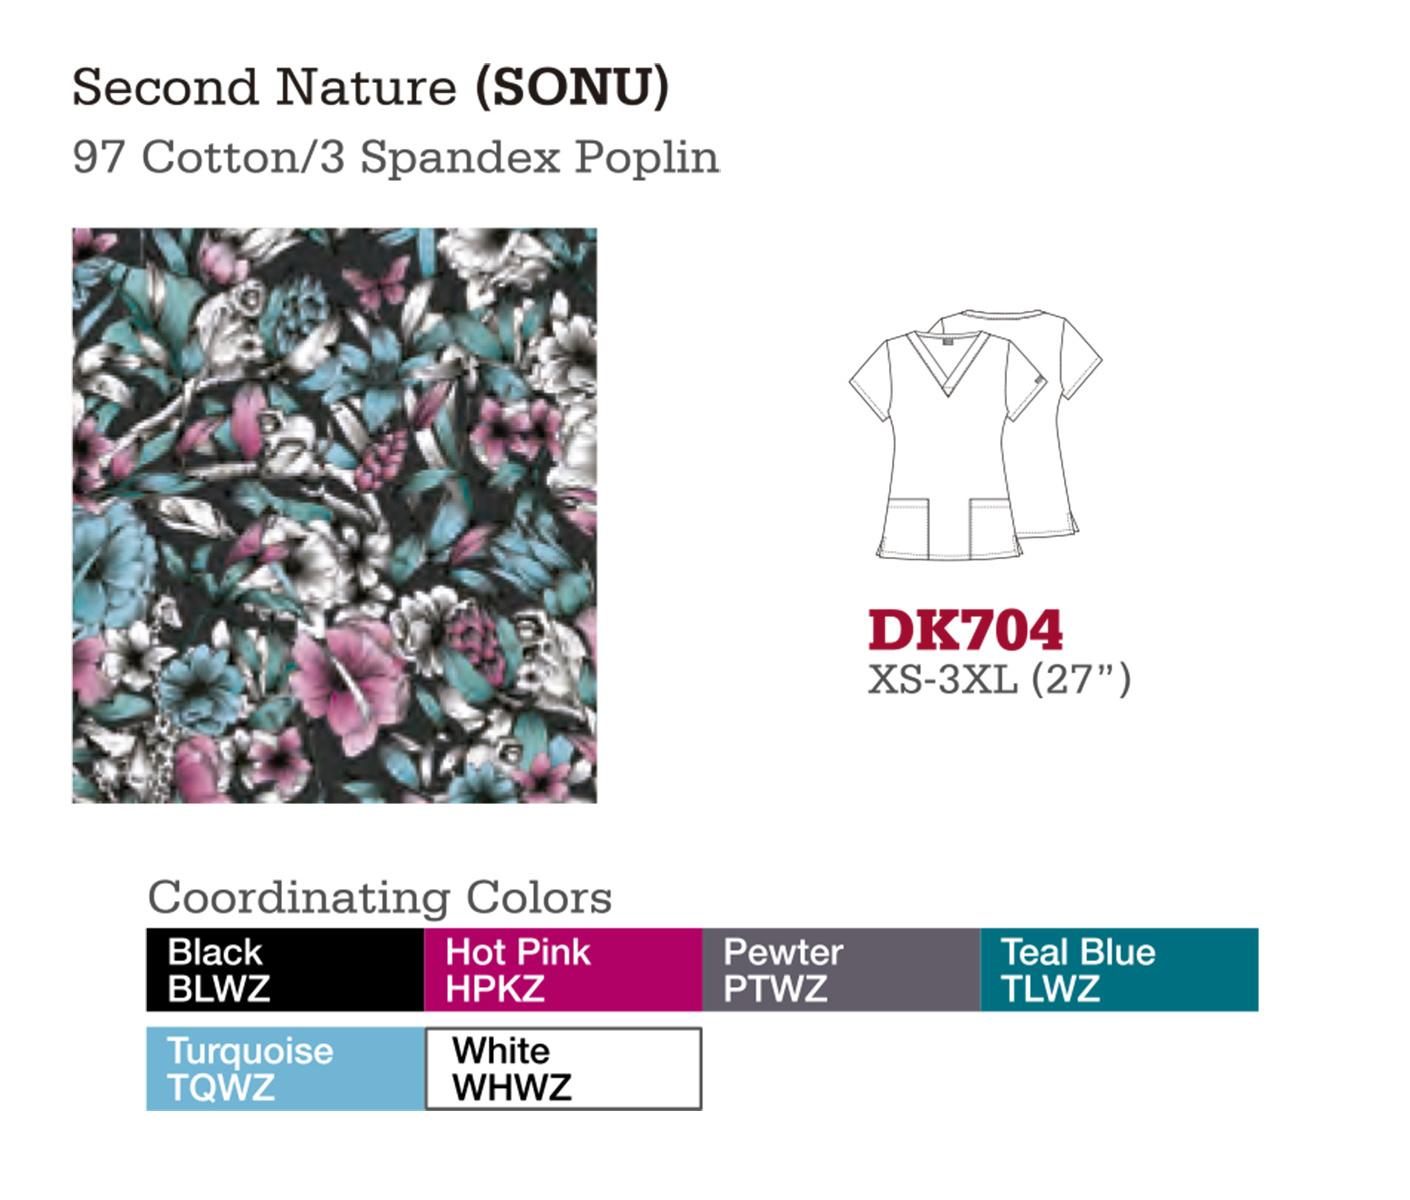 Second Nature. DK704.